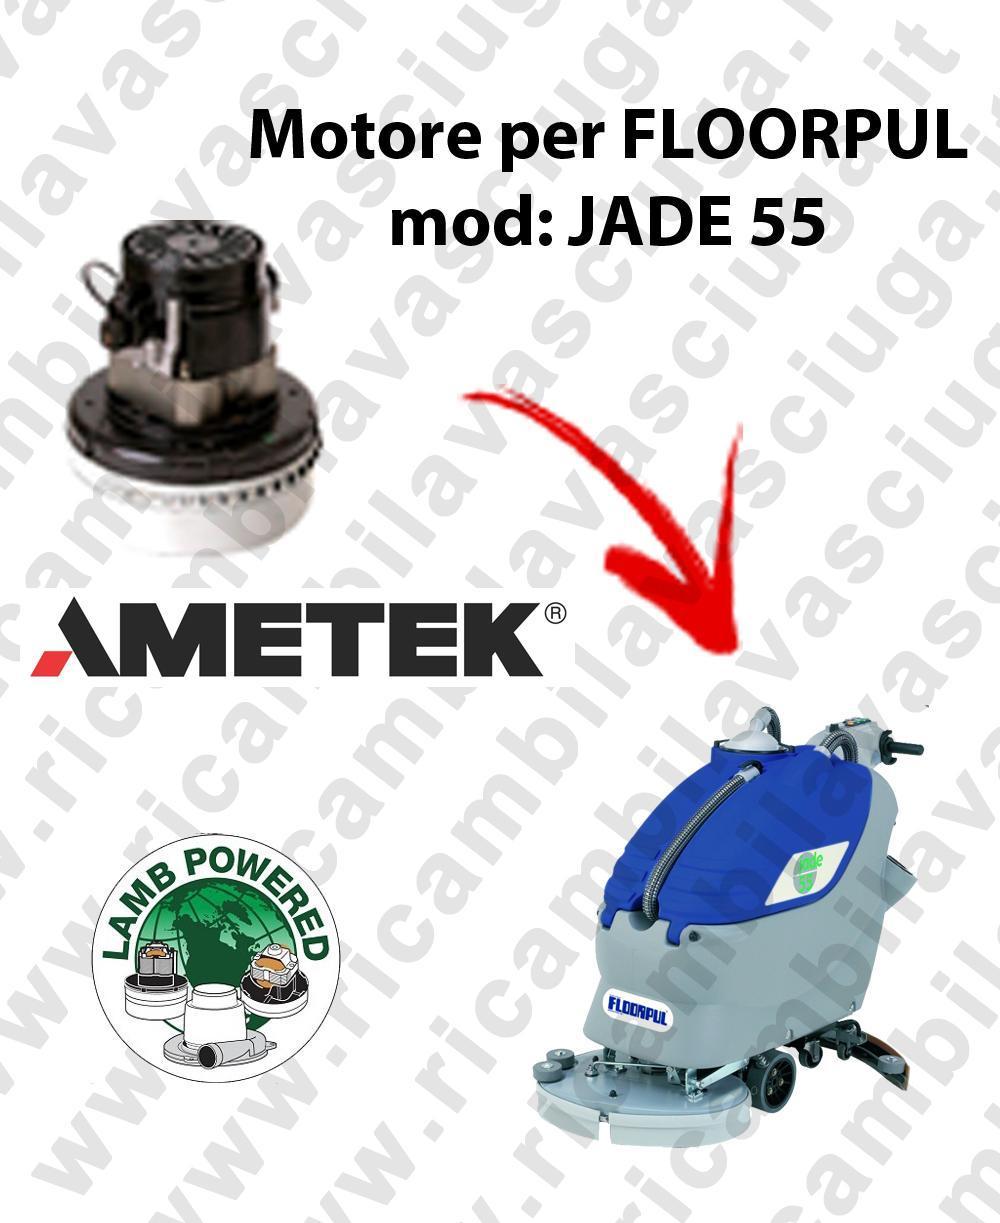 JADE 55 Motore de aspiración LAMB AMETEK para fregadora FLOORPUL